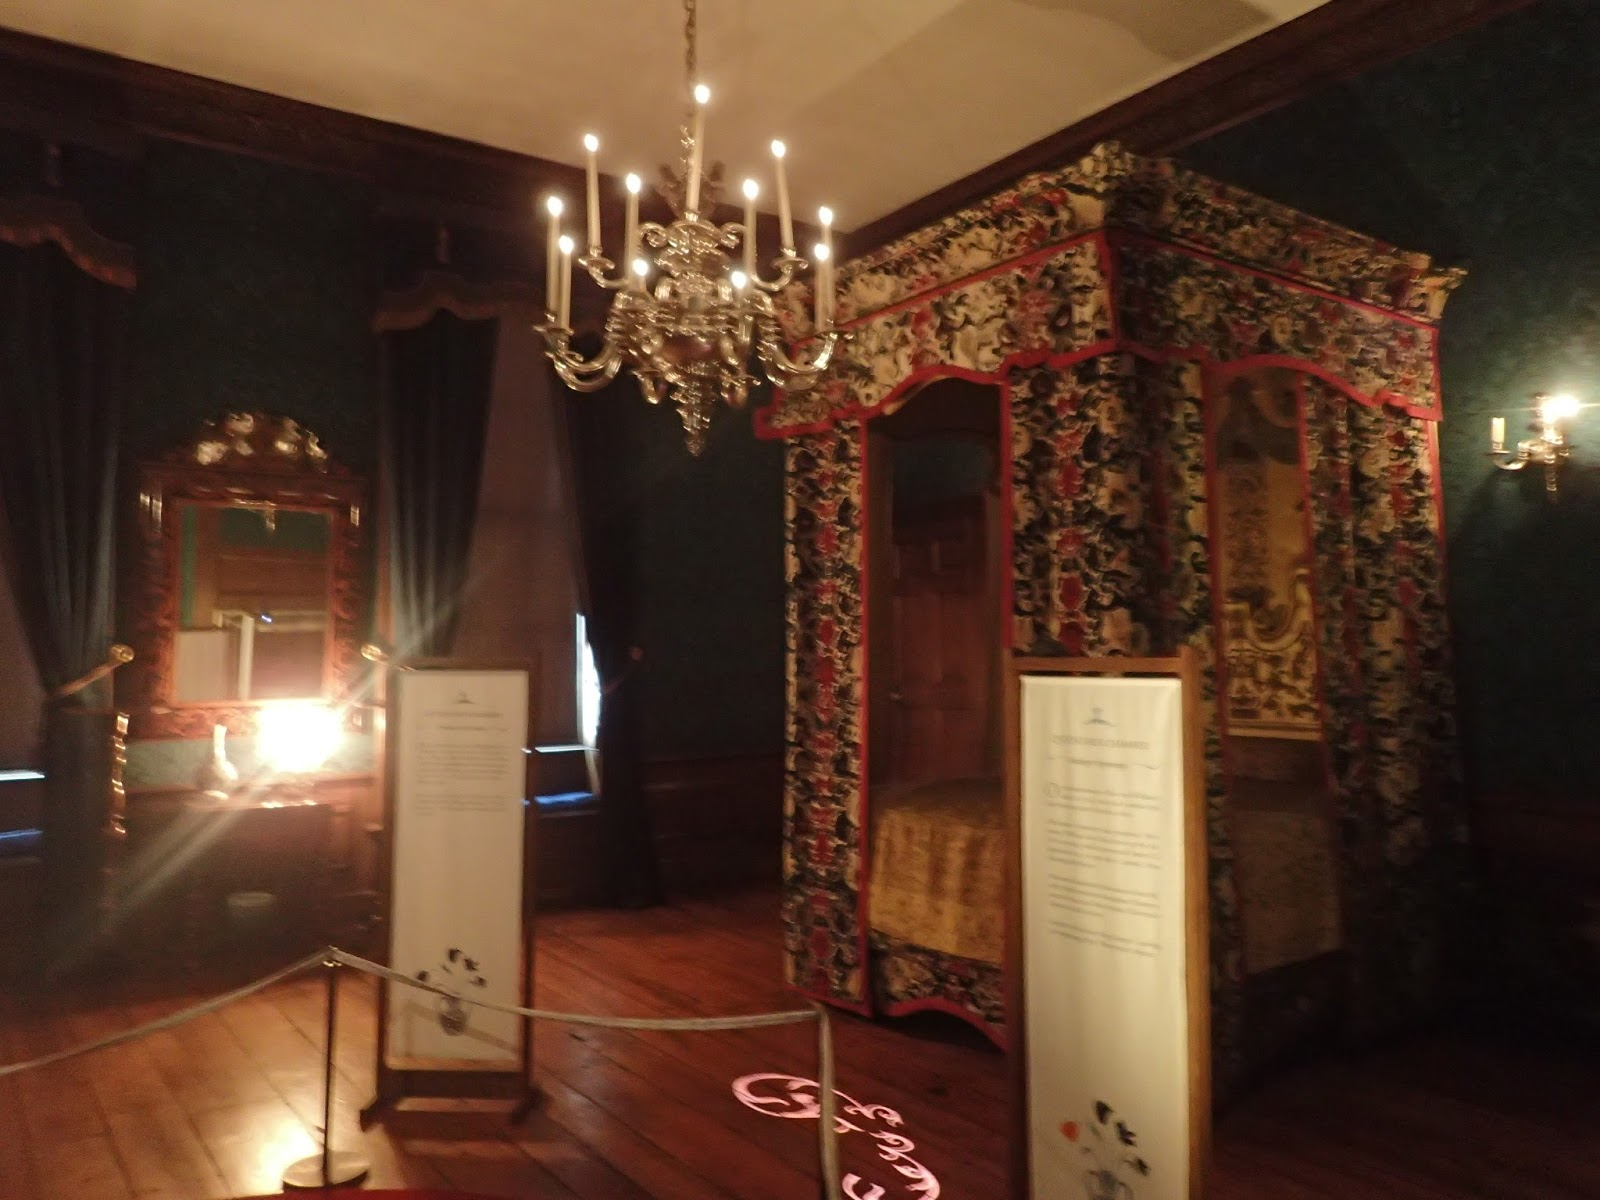 Msnomadica kensington palace Kensington palace state rooms